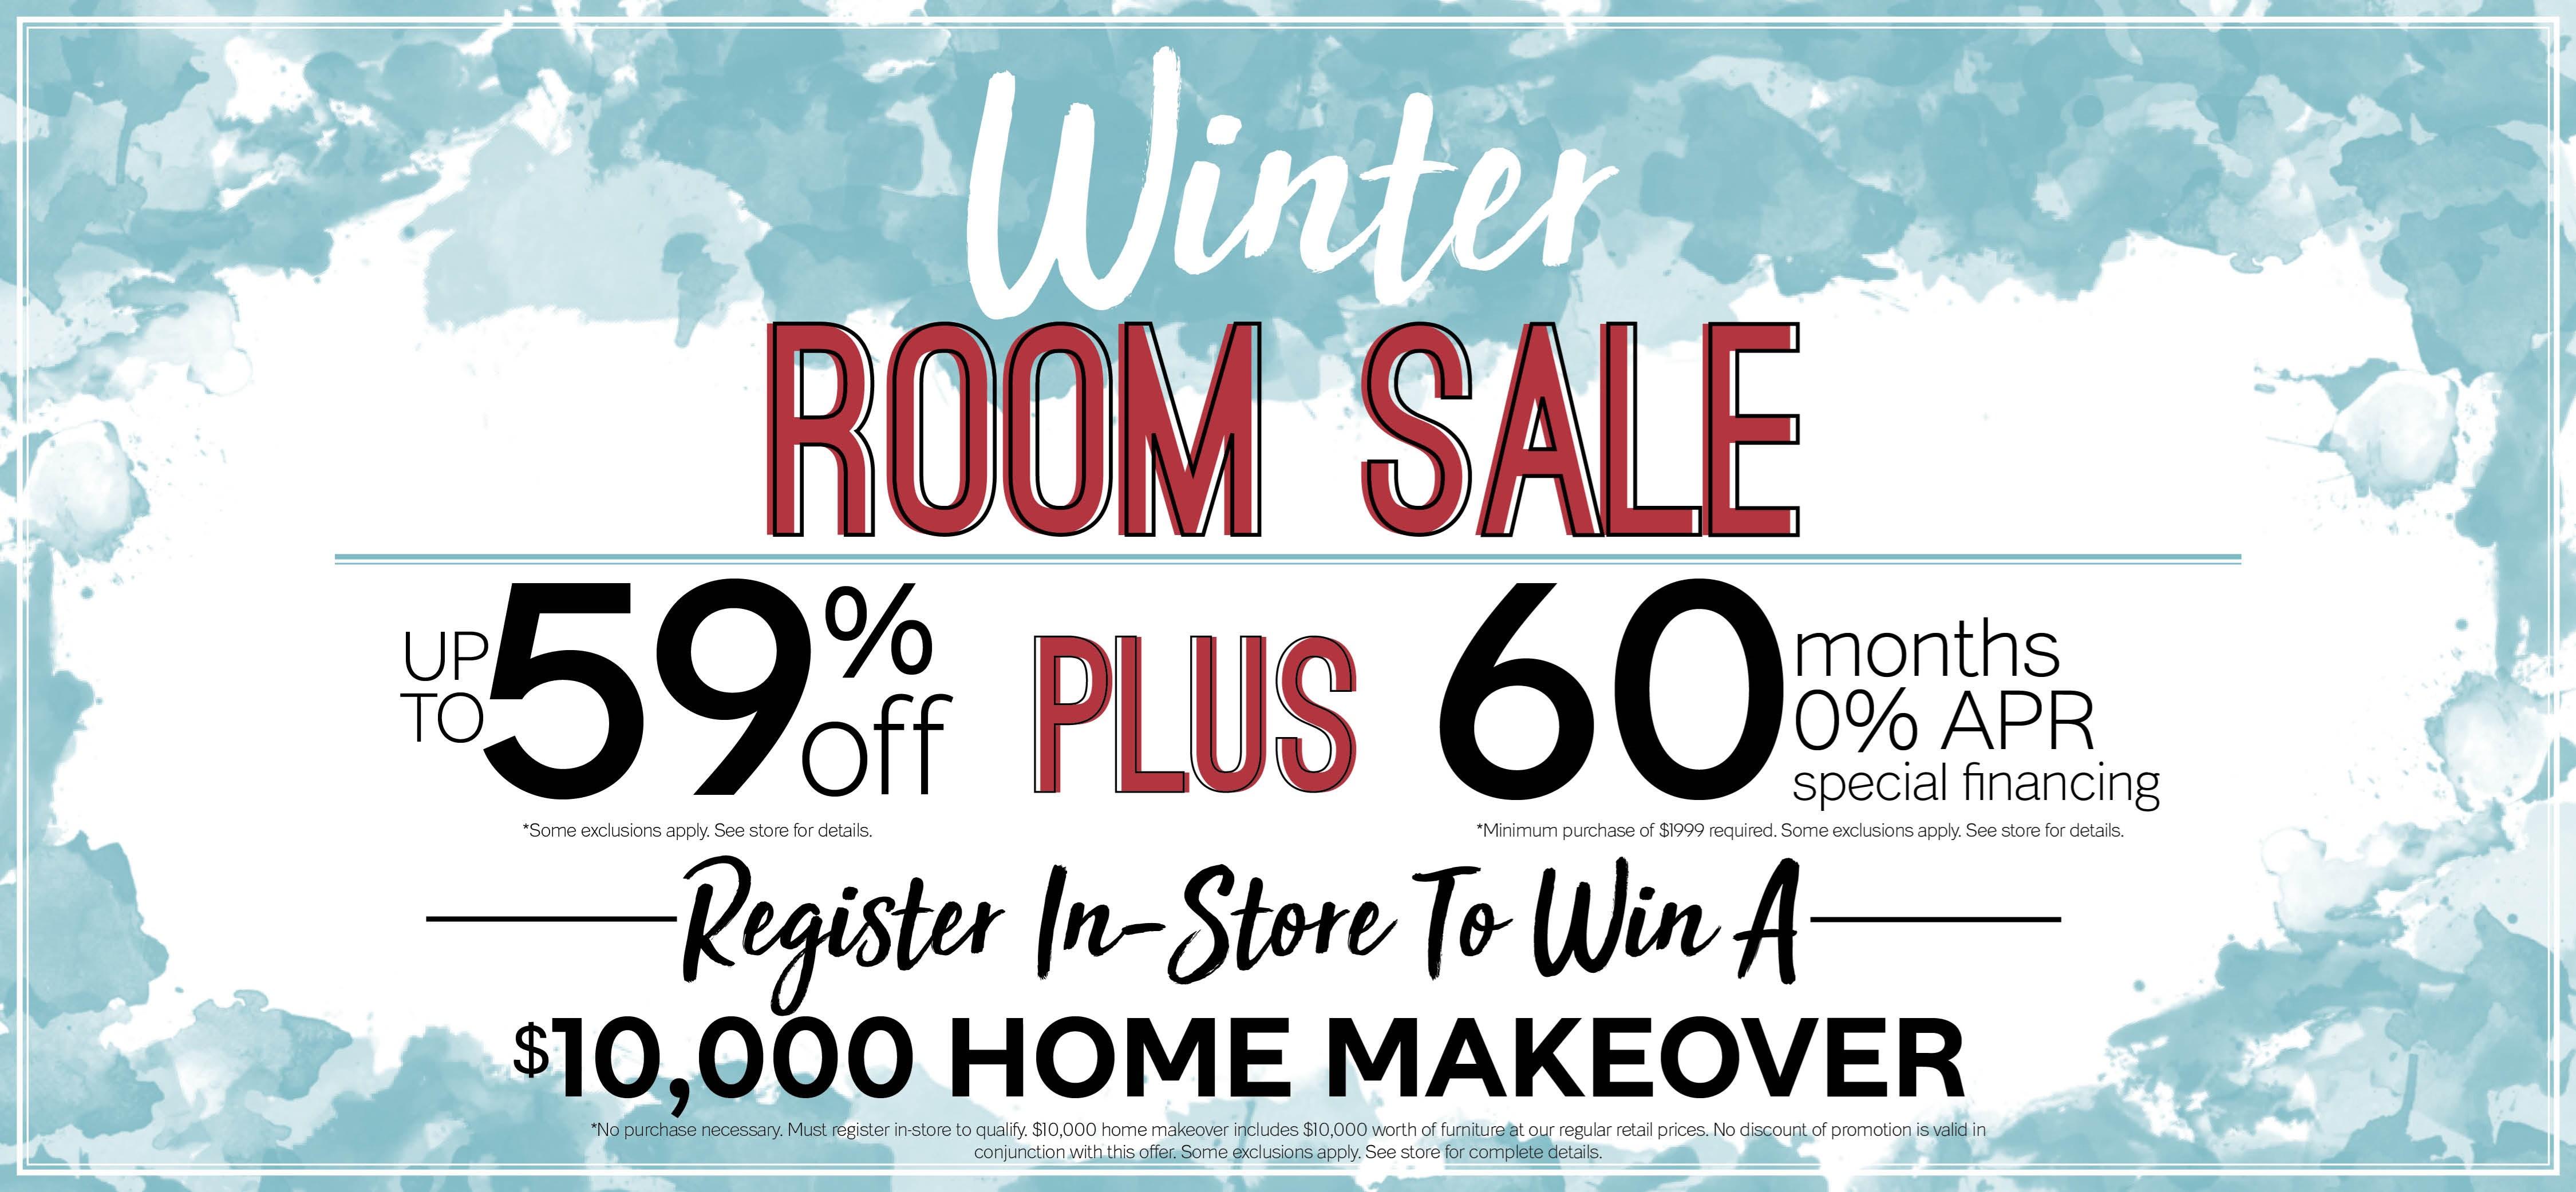 Furniture & ApplianceMart Winter Room Sale